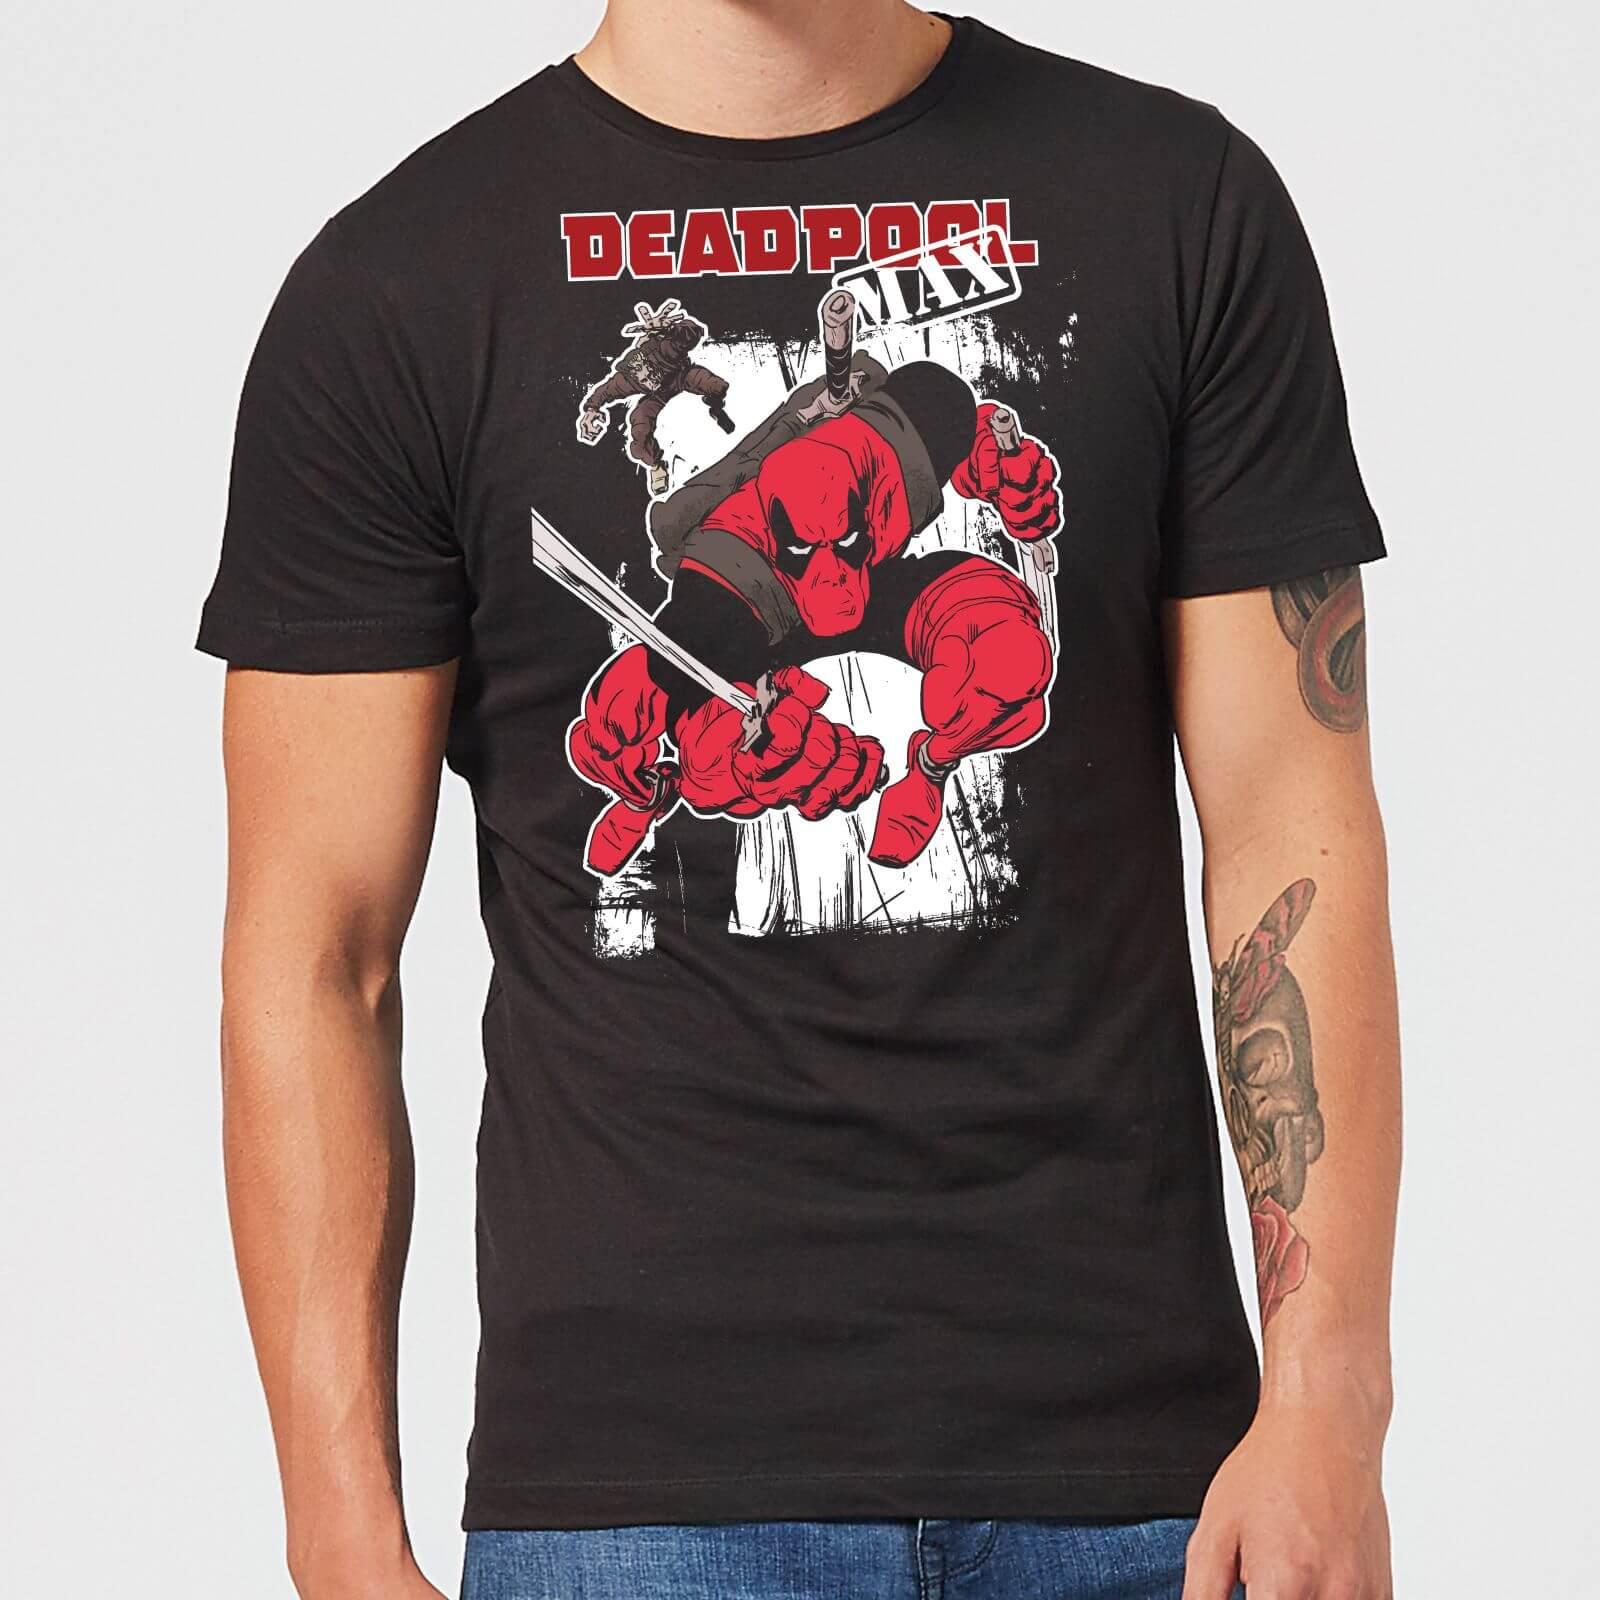 OfferteWeb.click 39-t-shirt-marvel-deadpool-max-nero-uomo-xxl-nero